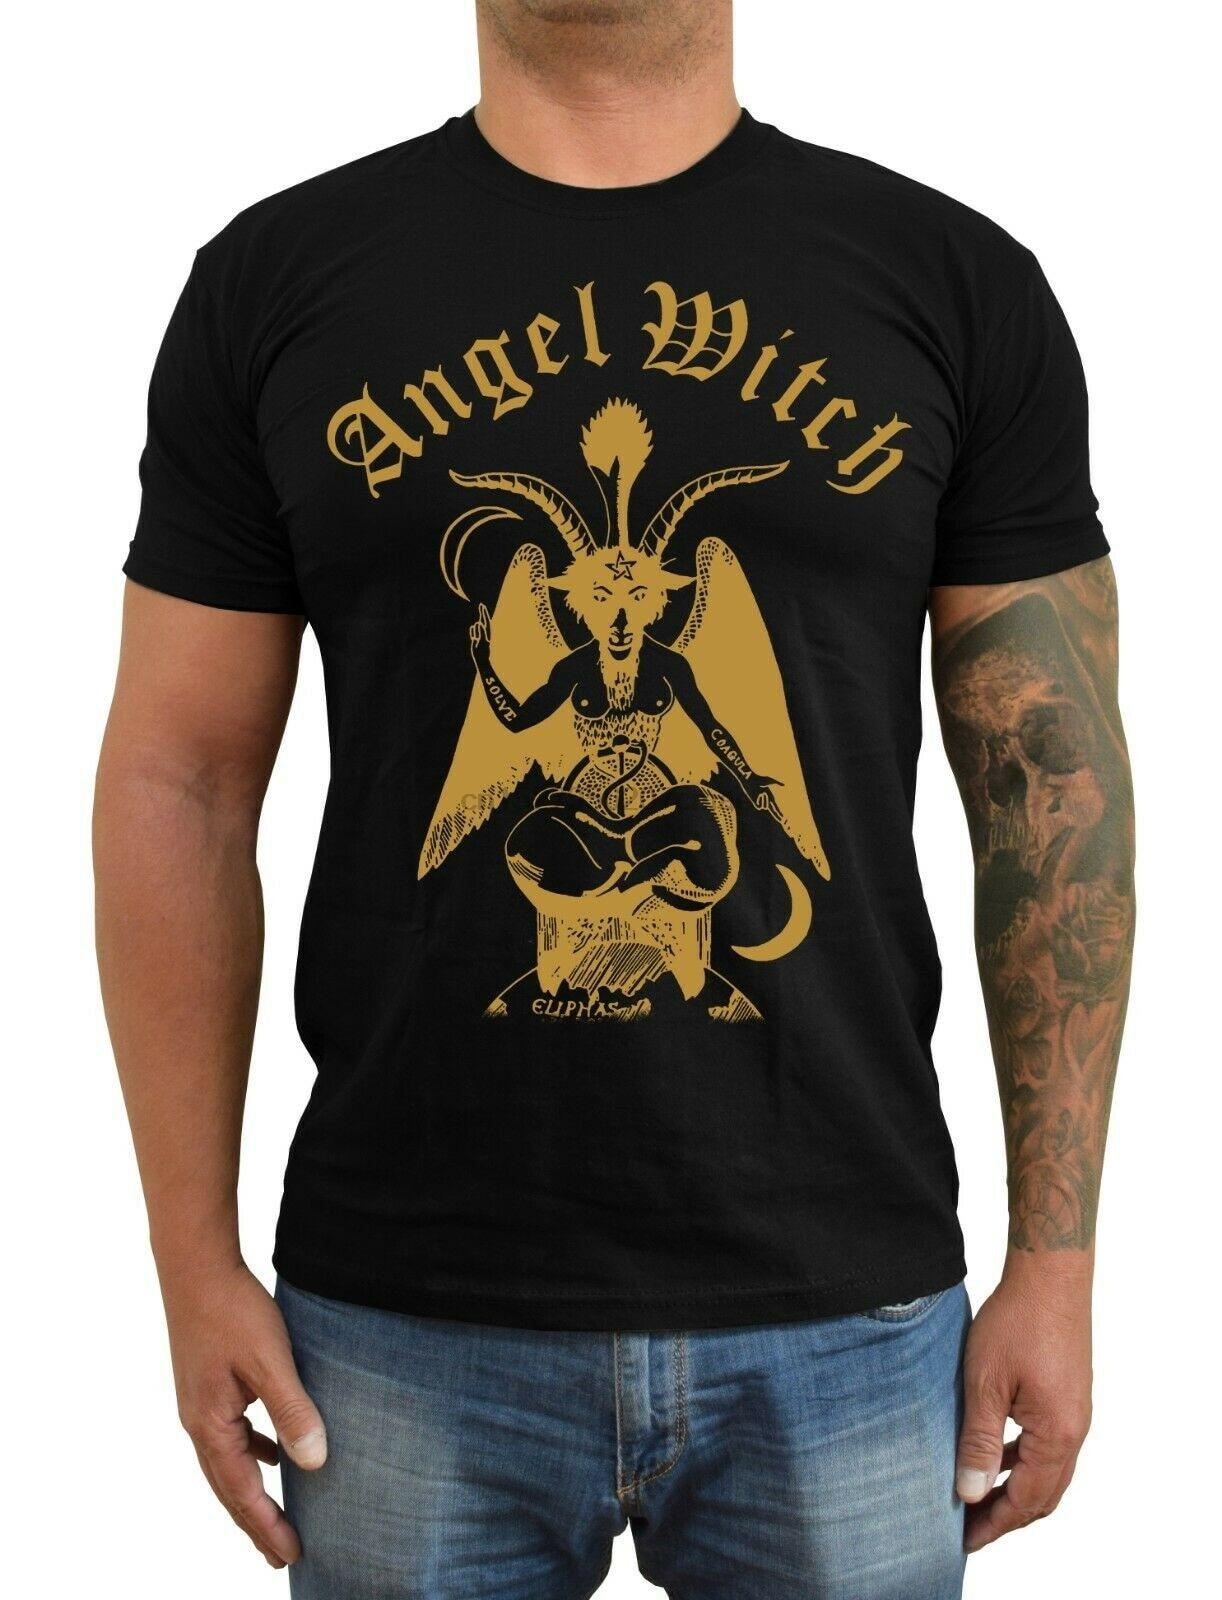 Anjo bruxa 1978r. Camiseta demo nwobhm heybourne (preto branco) S-5XL